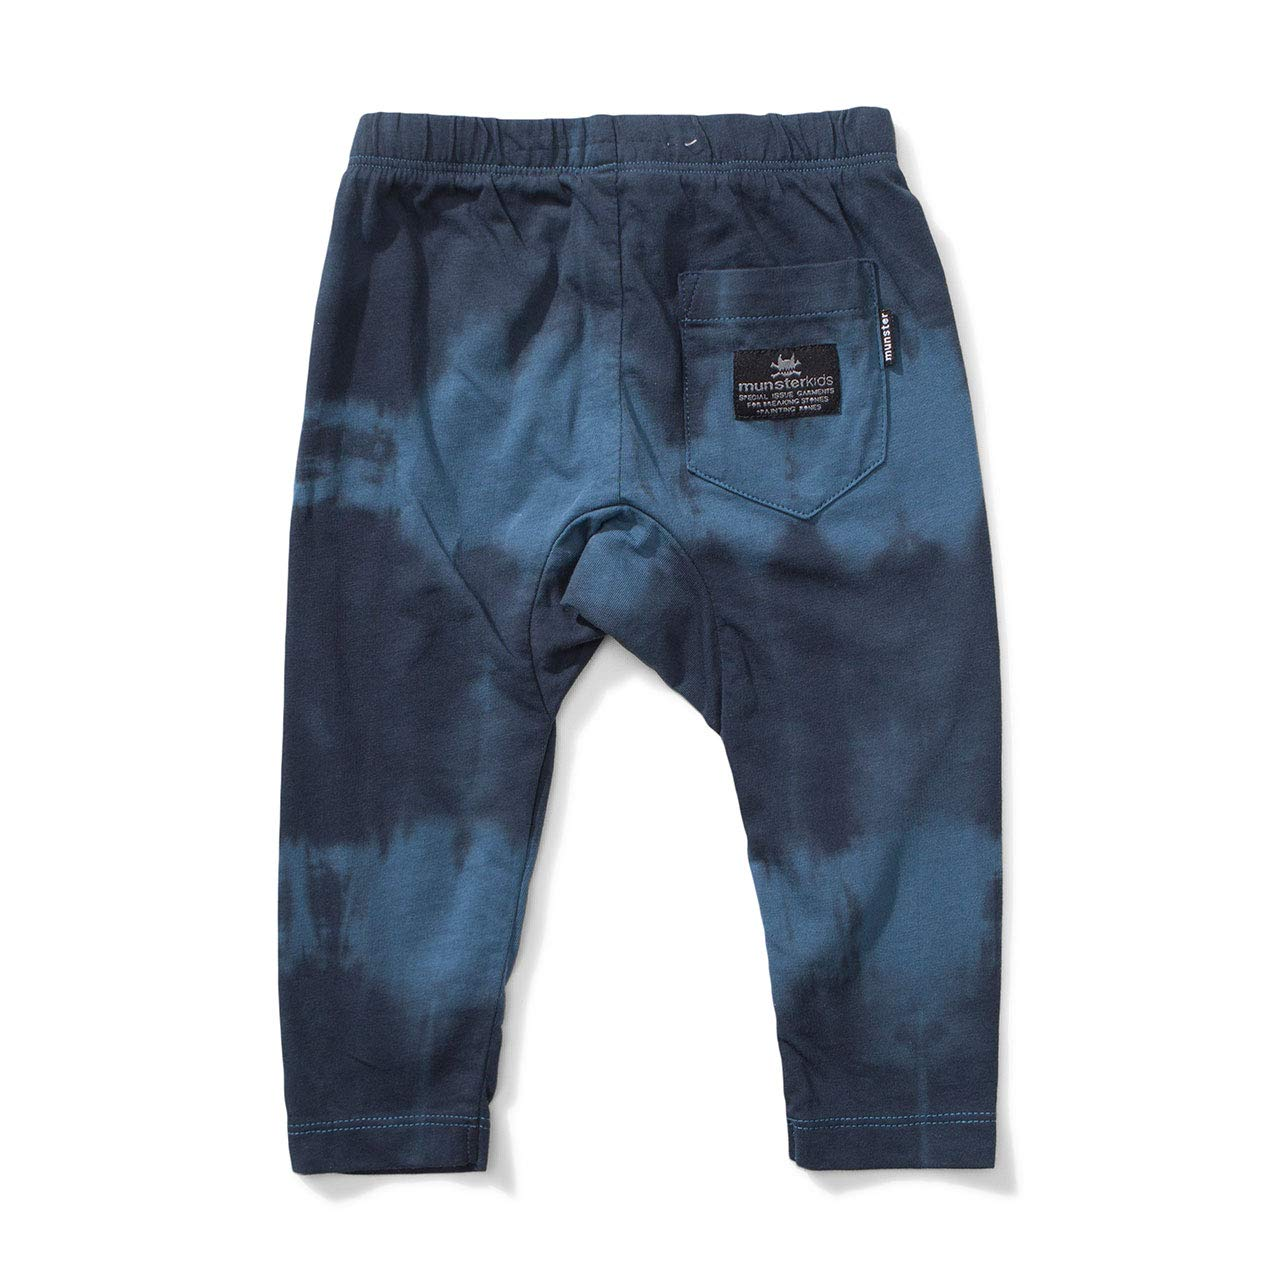 Baby Boys 3 Spills Pants Blue Size 3-6 Months Munster Kids Munster